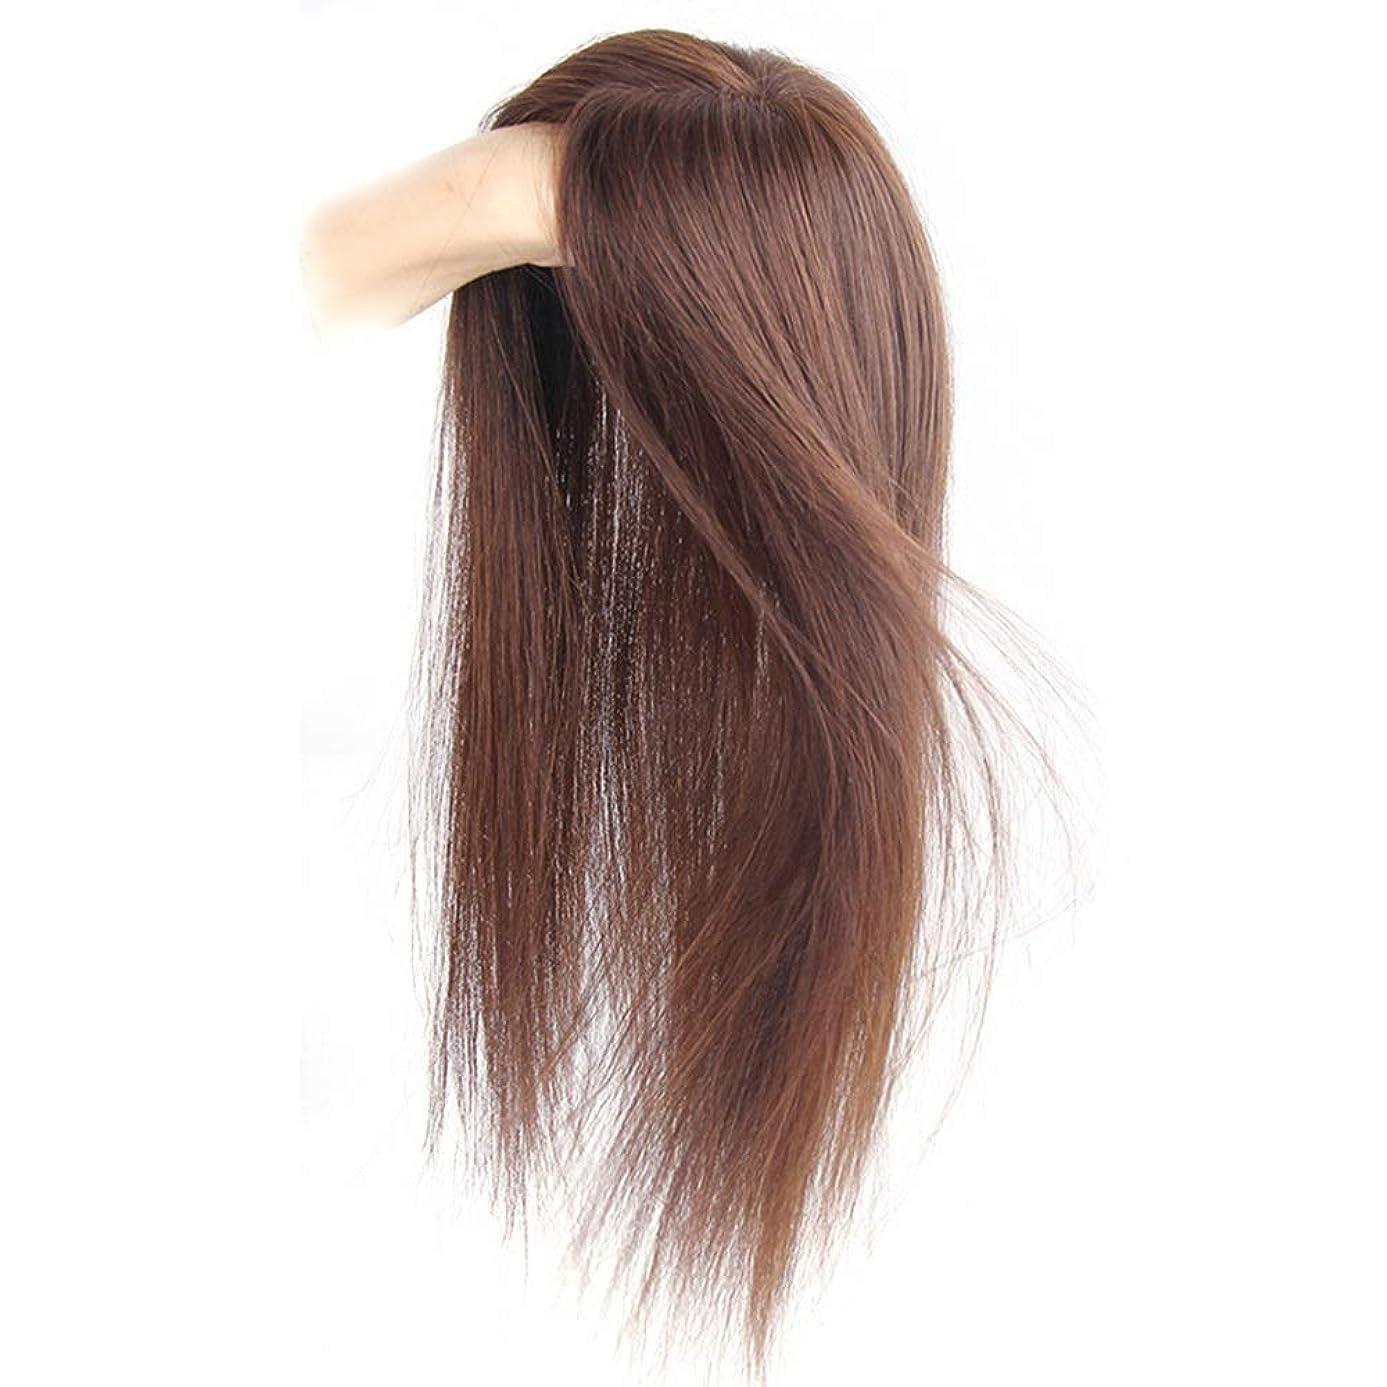 BOBIDYEE 本物のヘアエクステンションでクリップストレートの女性のための絹のようなnatrual見る女性の合成かつらレースかつらロールプレイングかつら (色 : [7x10] 17cm natural black)